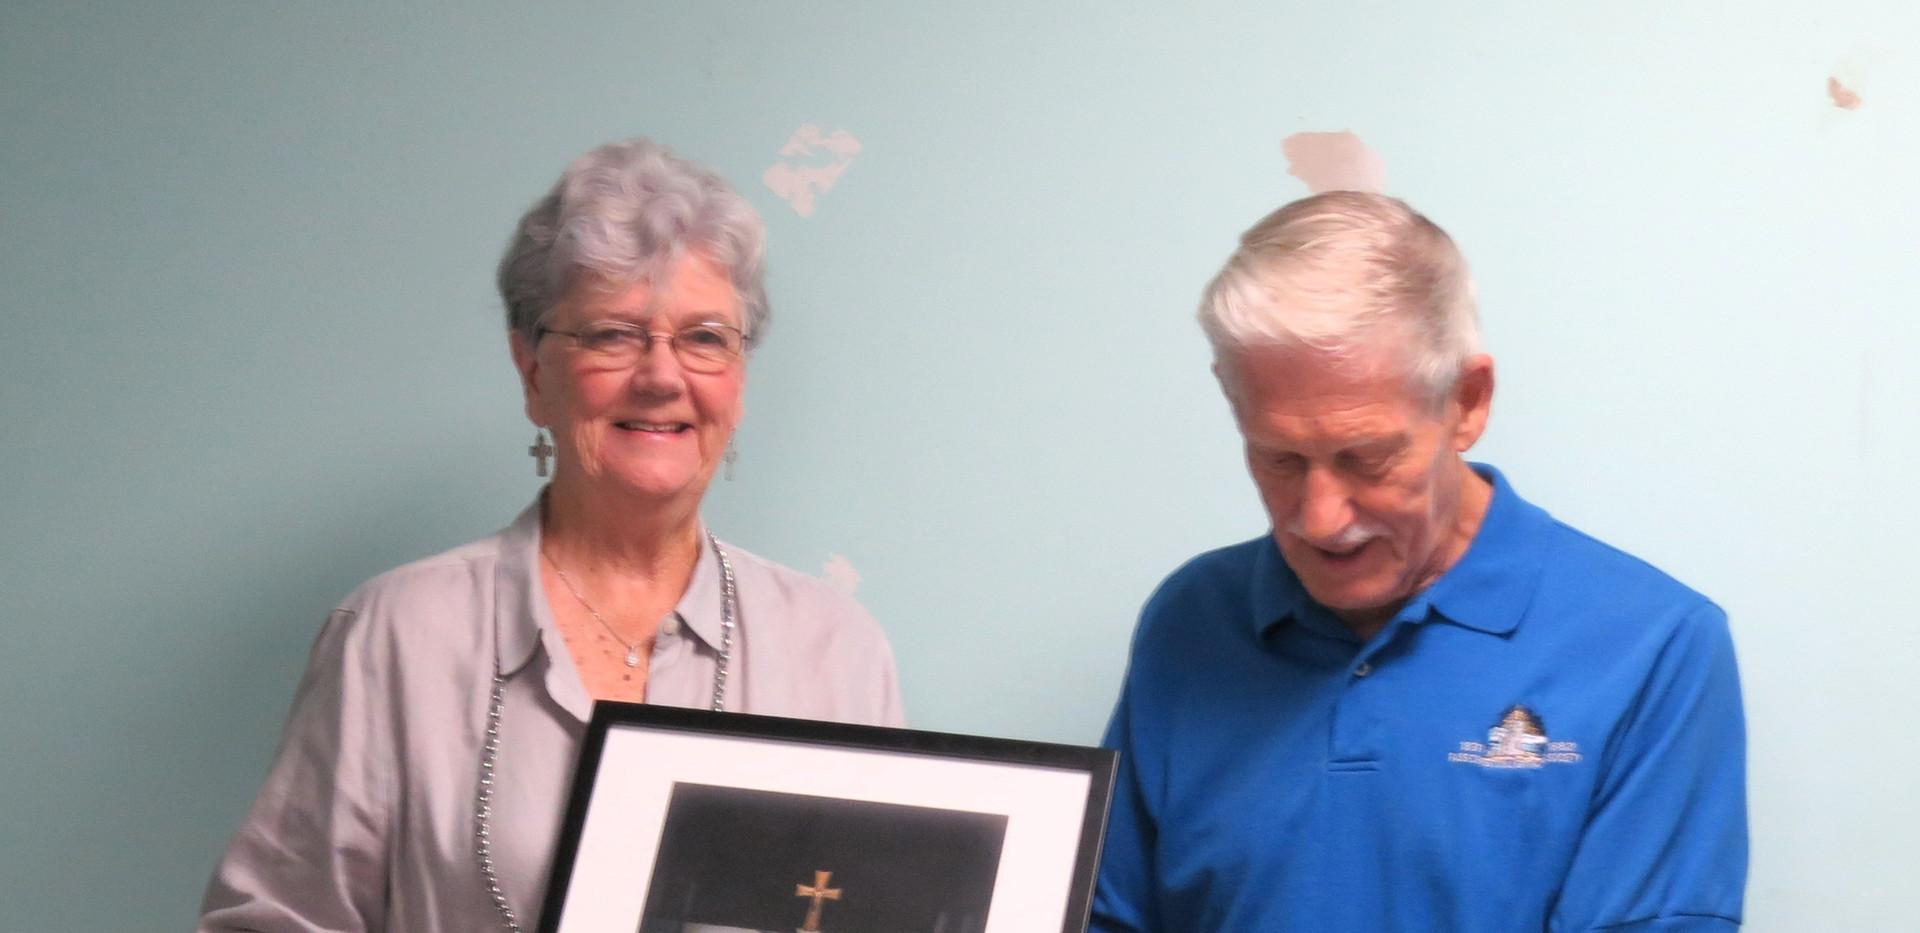 Donna H honoring Lou Rizzardi